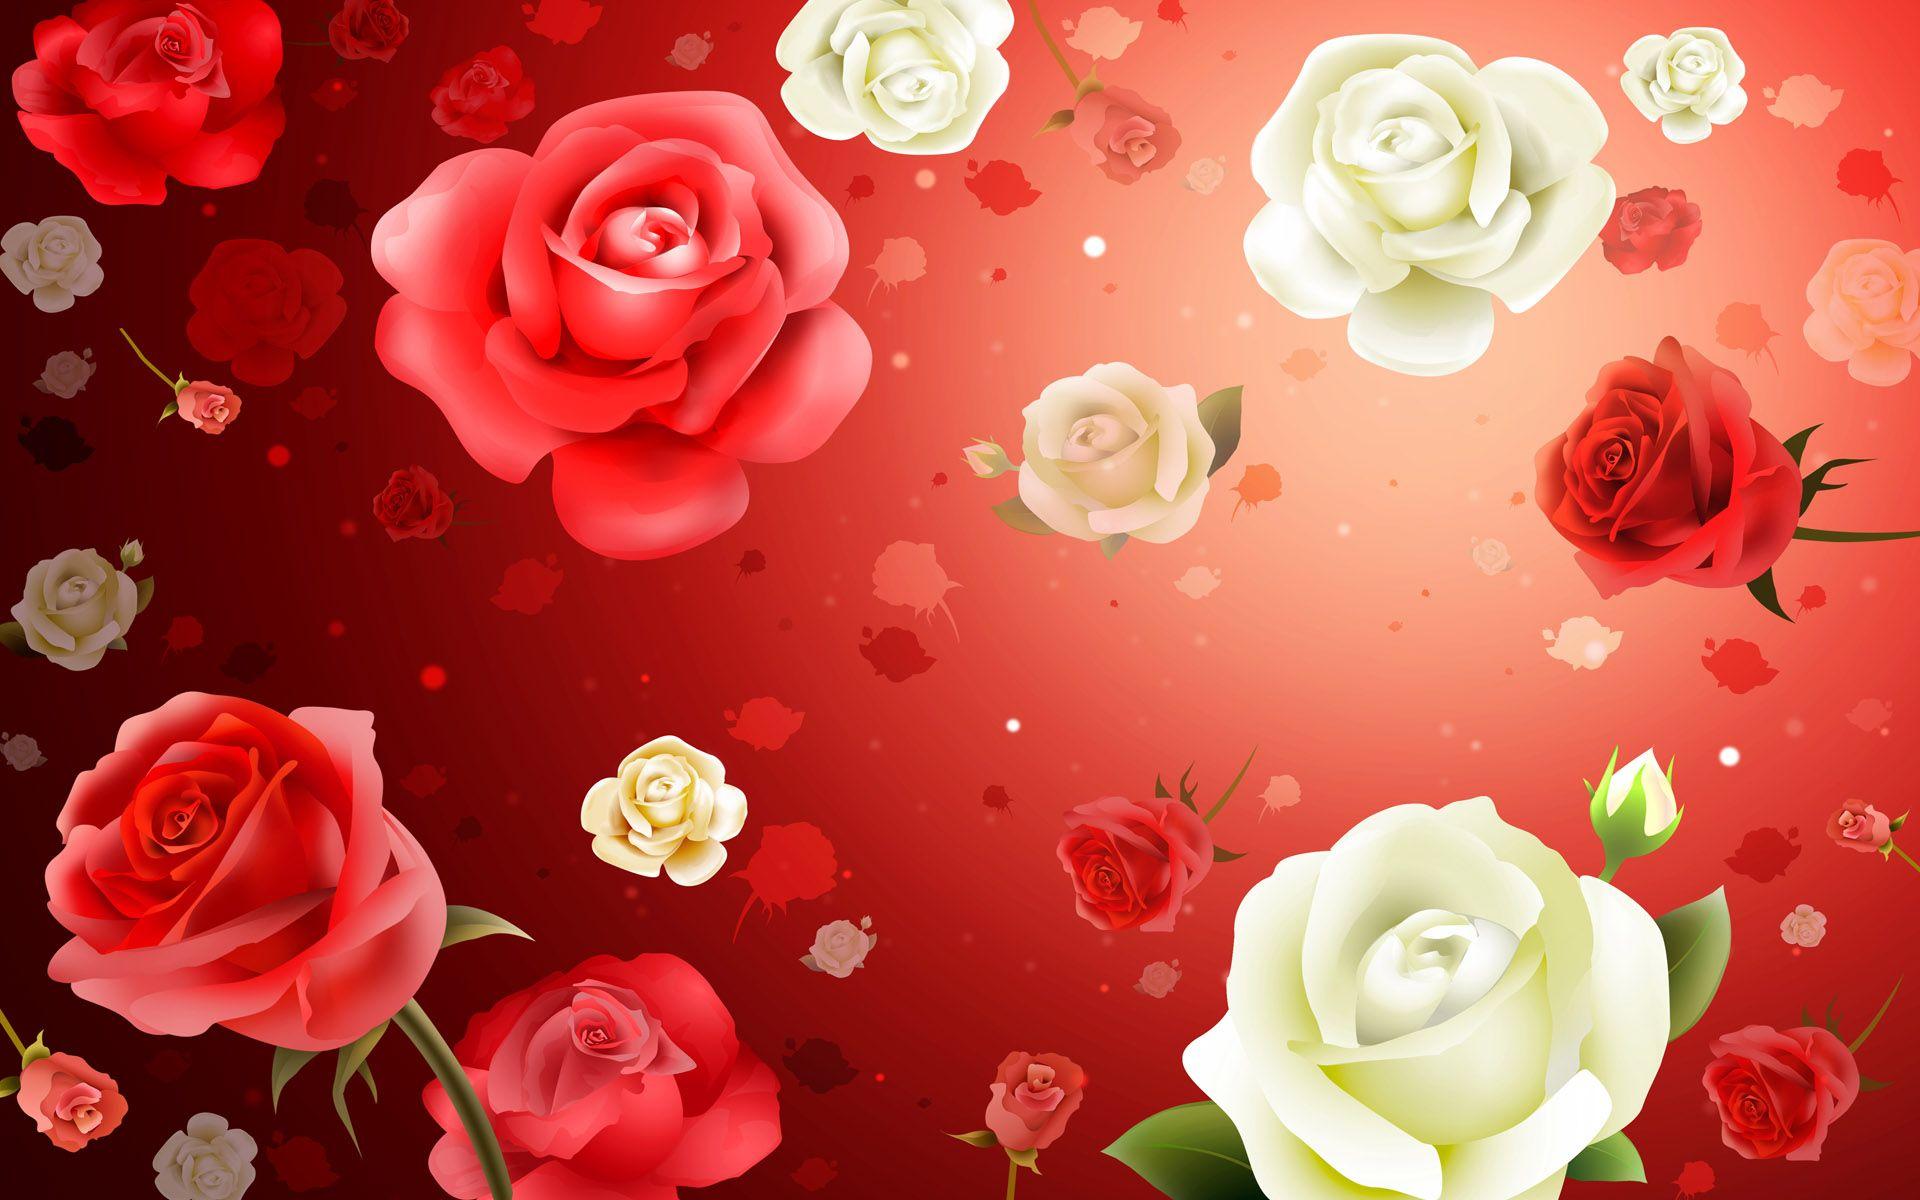 Red White Rose Hd Wallpaper For Desktop Creativity Hd Wallpaper